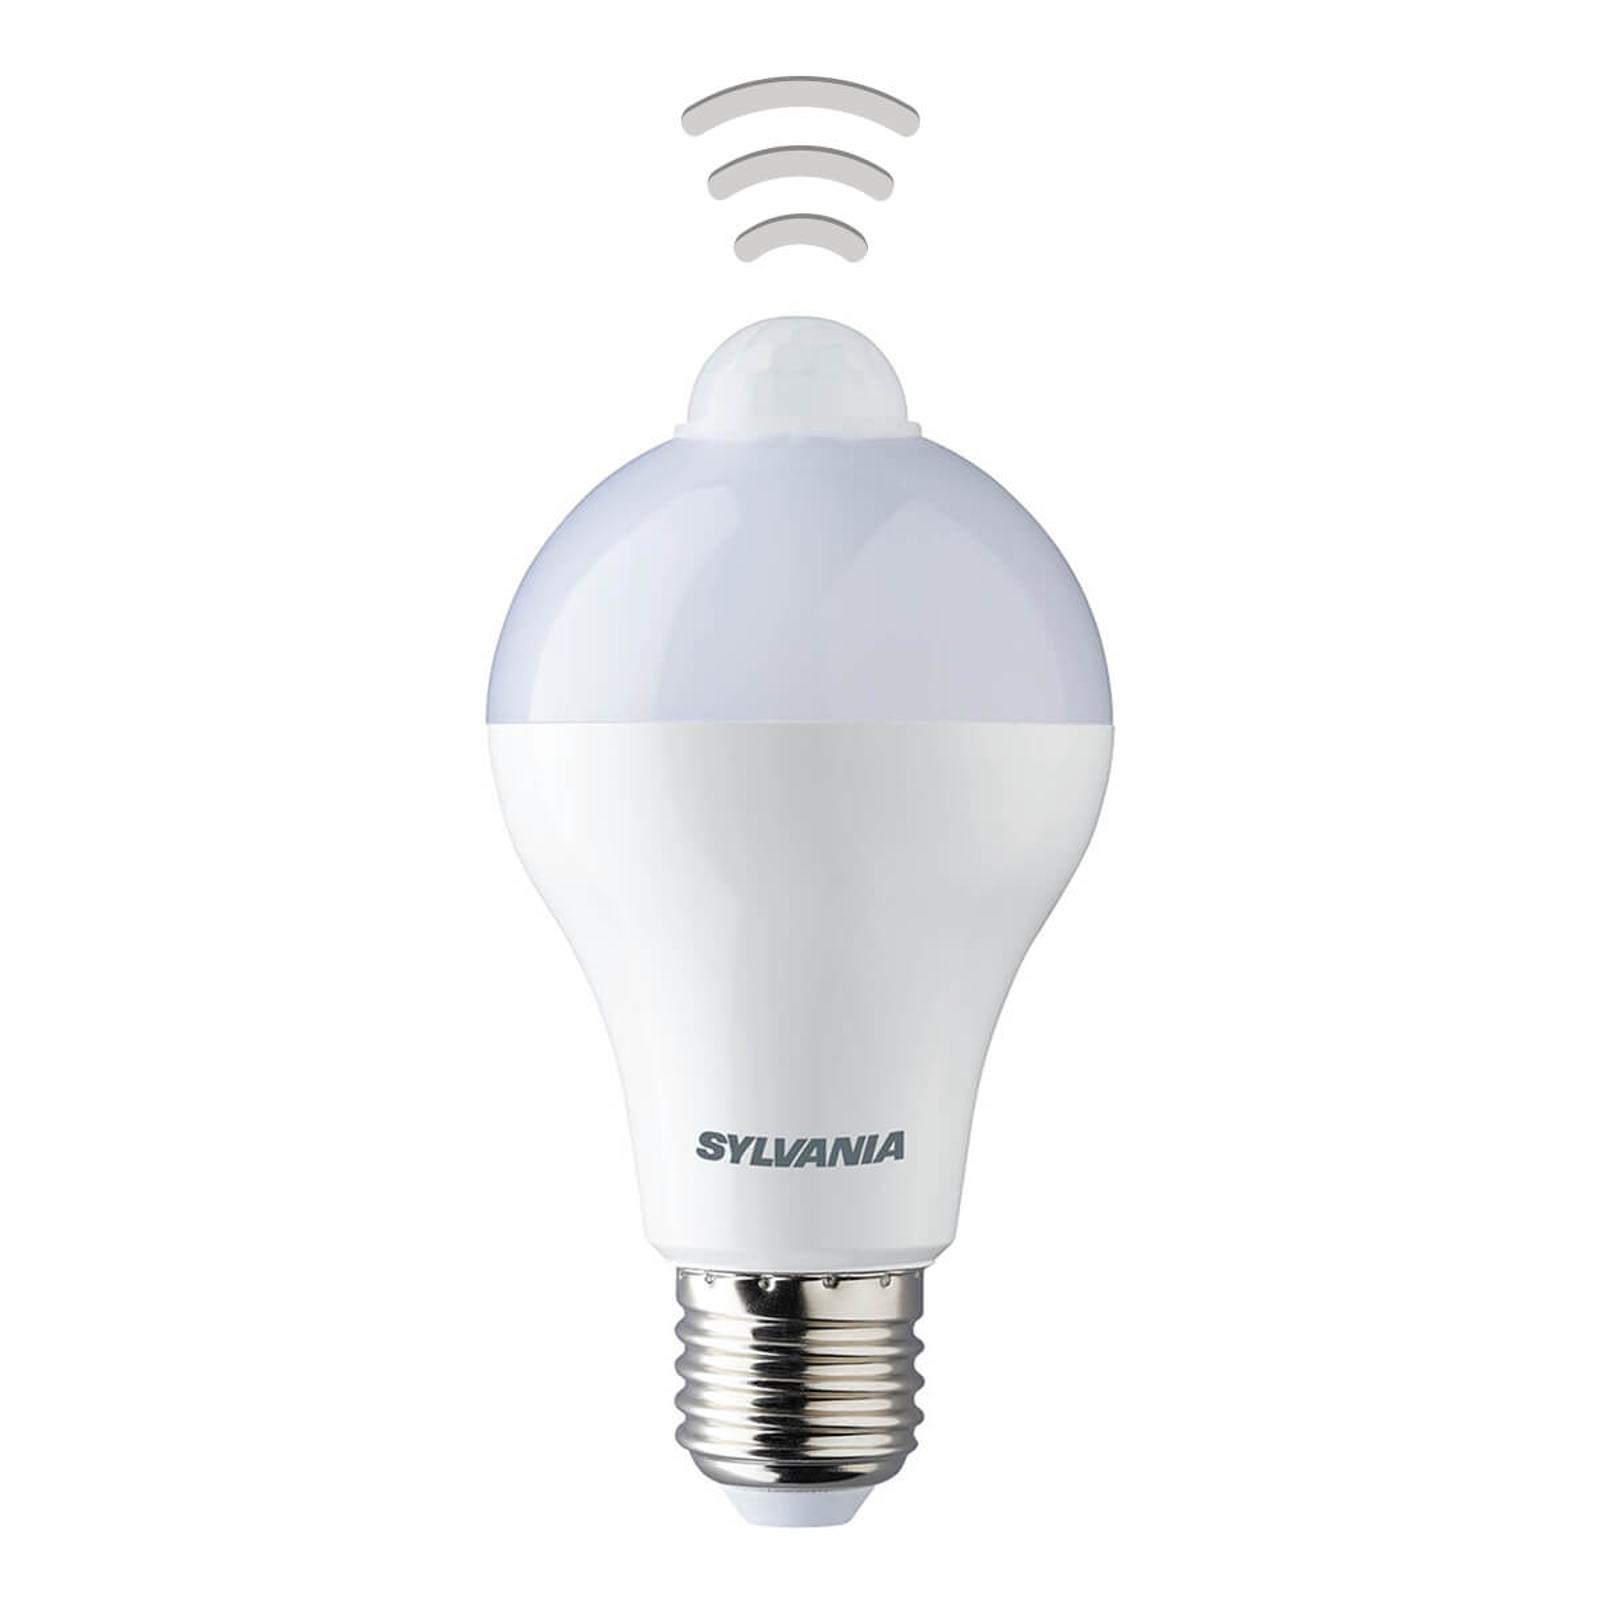 Acquista Lampadina LED PresenceE27 12W bianco caldo 1.050lm